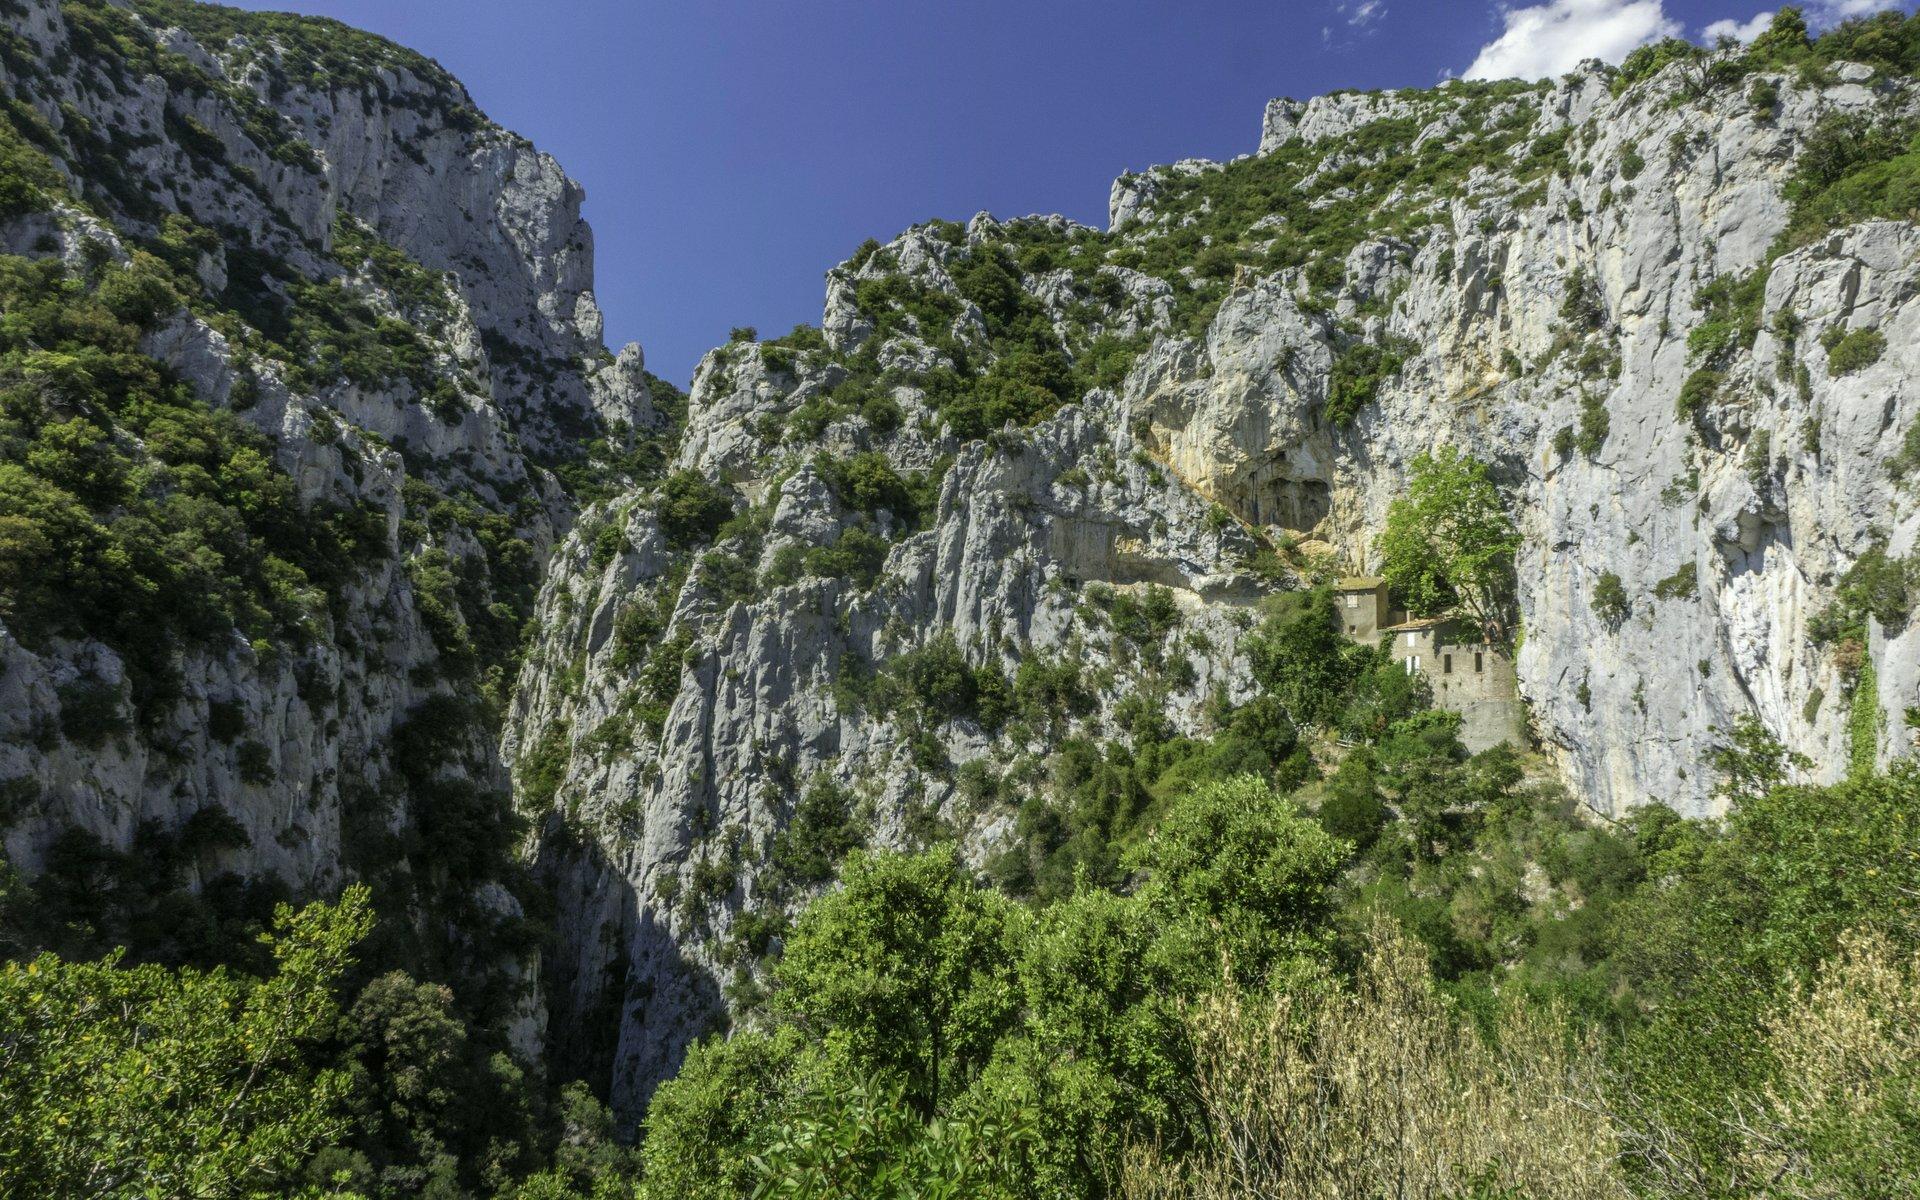 Gorges de Galamus und Ermitage Saint-Antoine